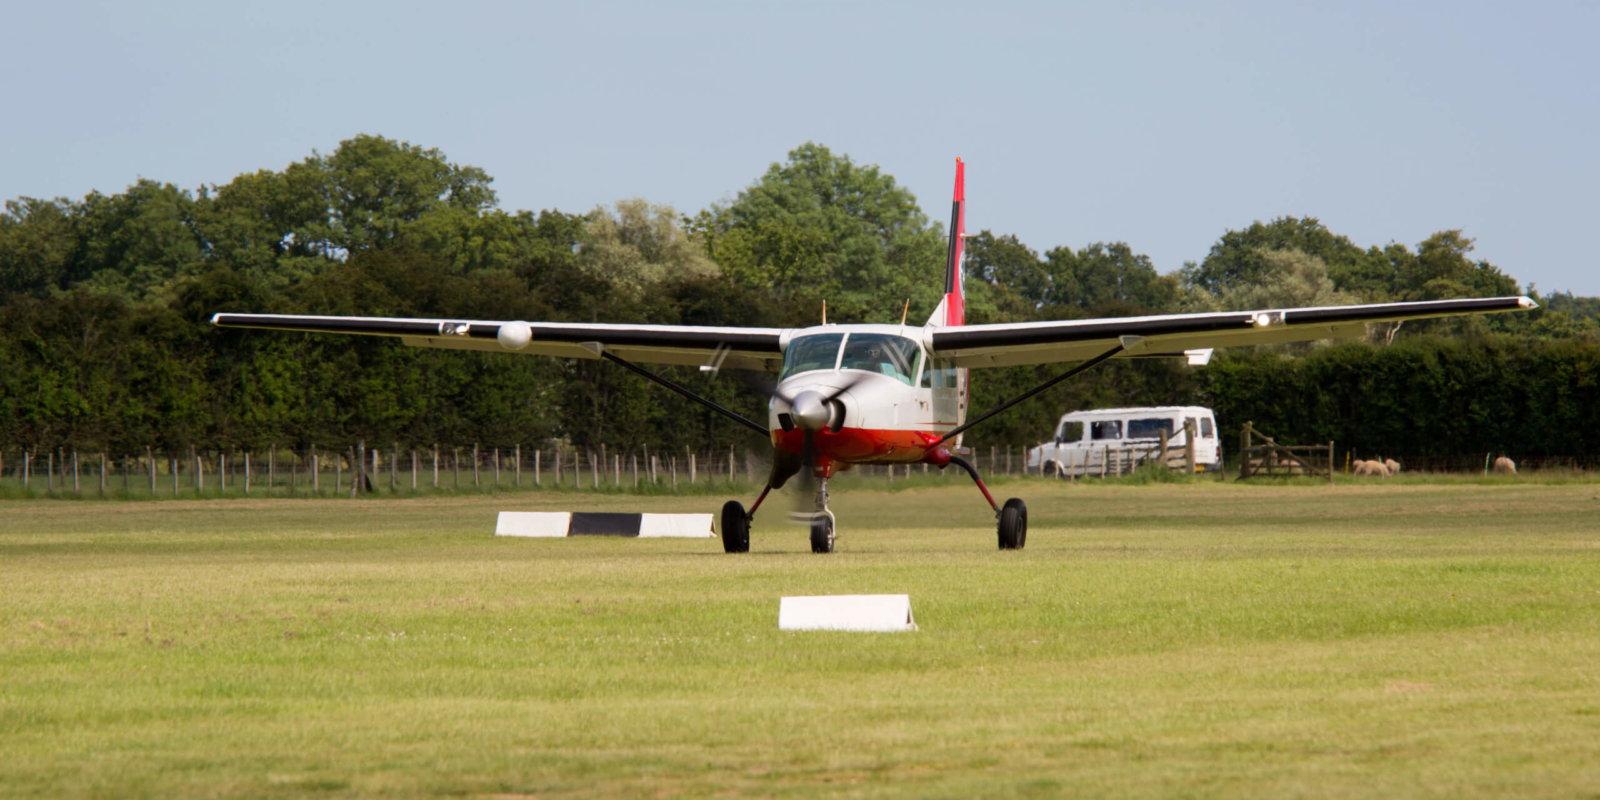 Cessna 208 Caravan 1 G-GOHI Rusol Air Headcorn Parachute Club landing on grass runway at Headcorn Airfield